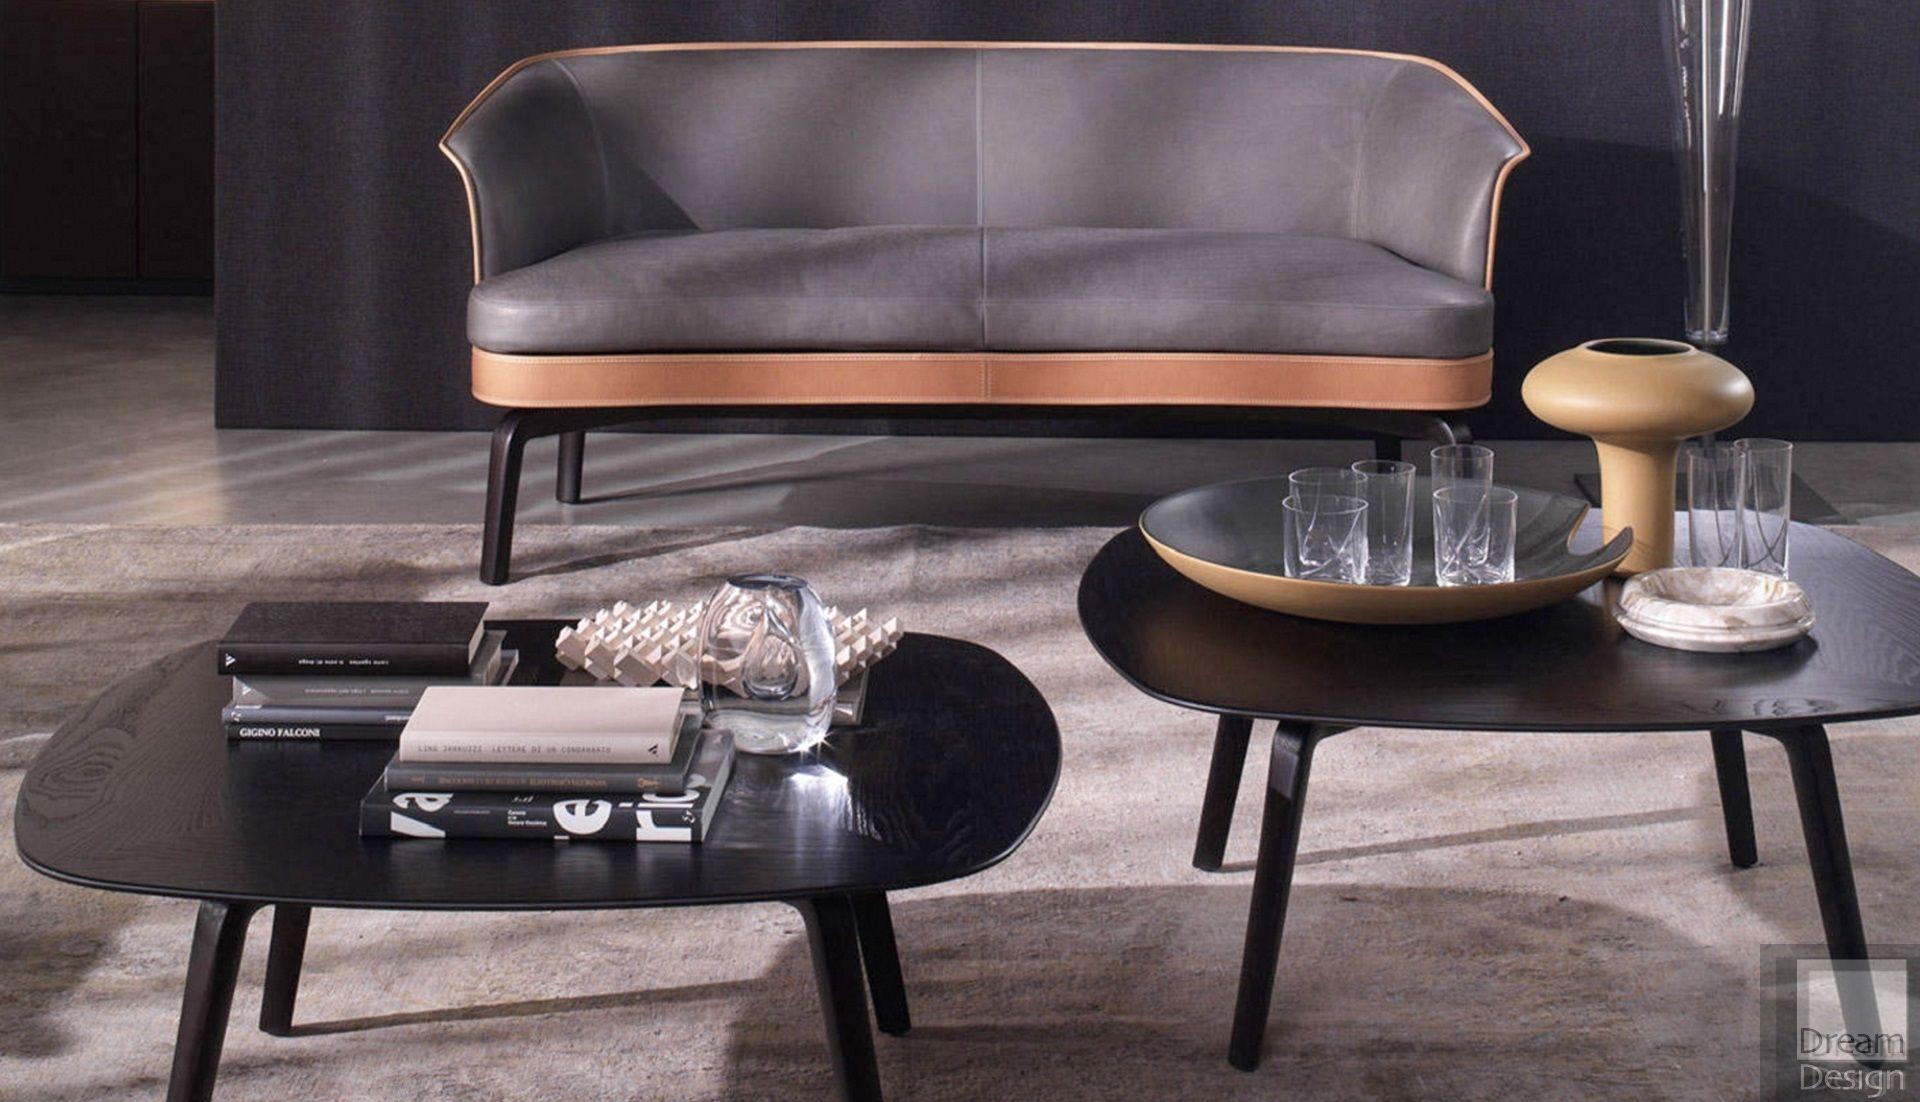 poltrona frau nivola sofa by roberto lazzeroni everything but ordinary. Black Bedroom Furniture Sets. Home Design Ideas